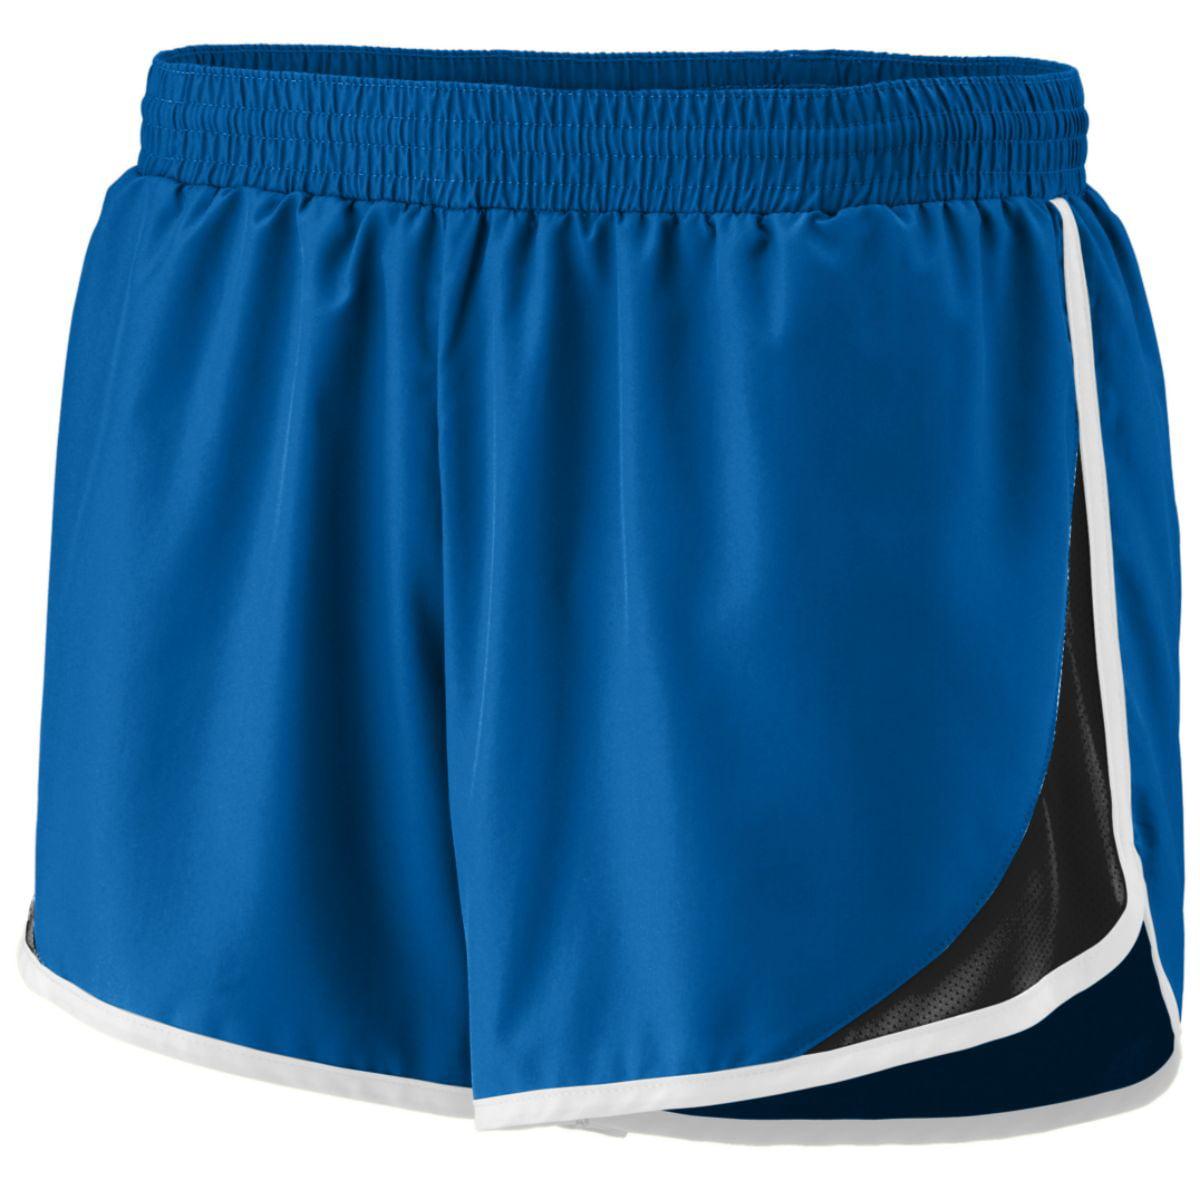 Augusta Sportswear Girls' Adrenaline Short S Royal/Black/White - image 1 of 1